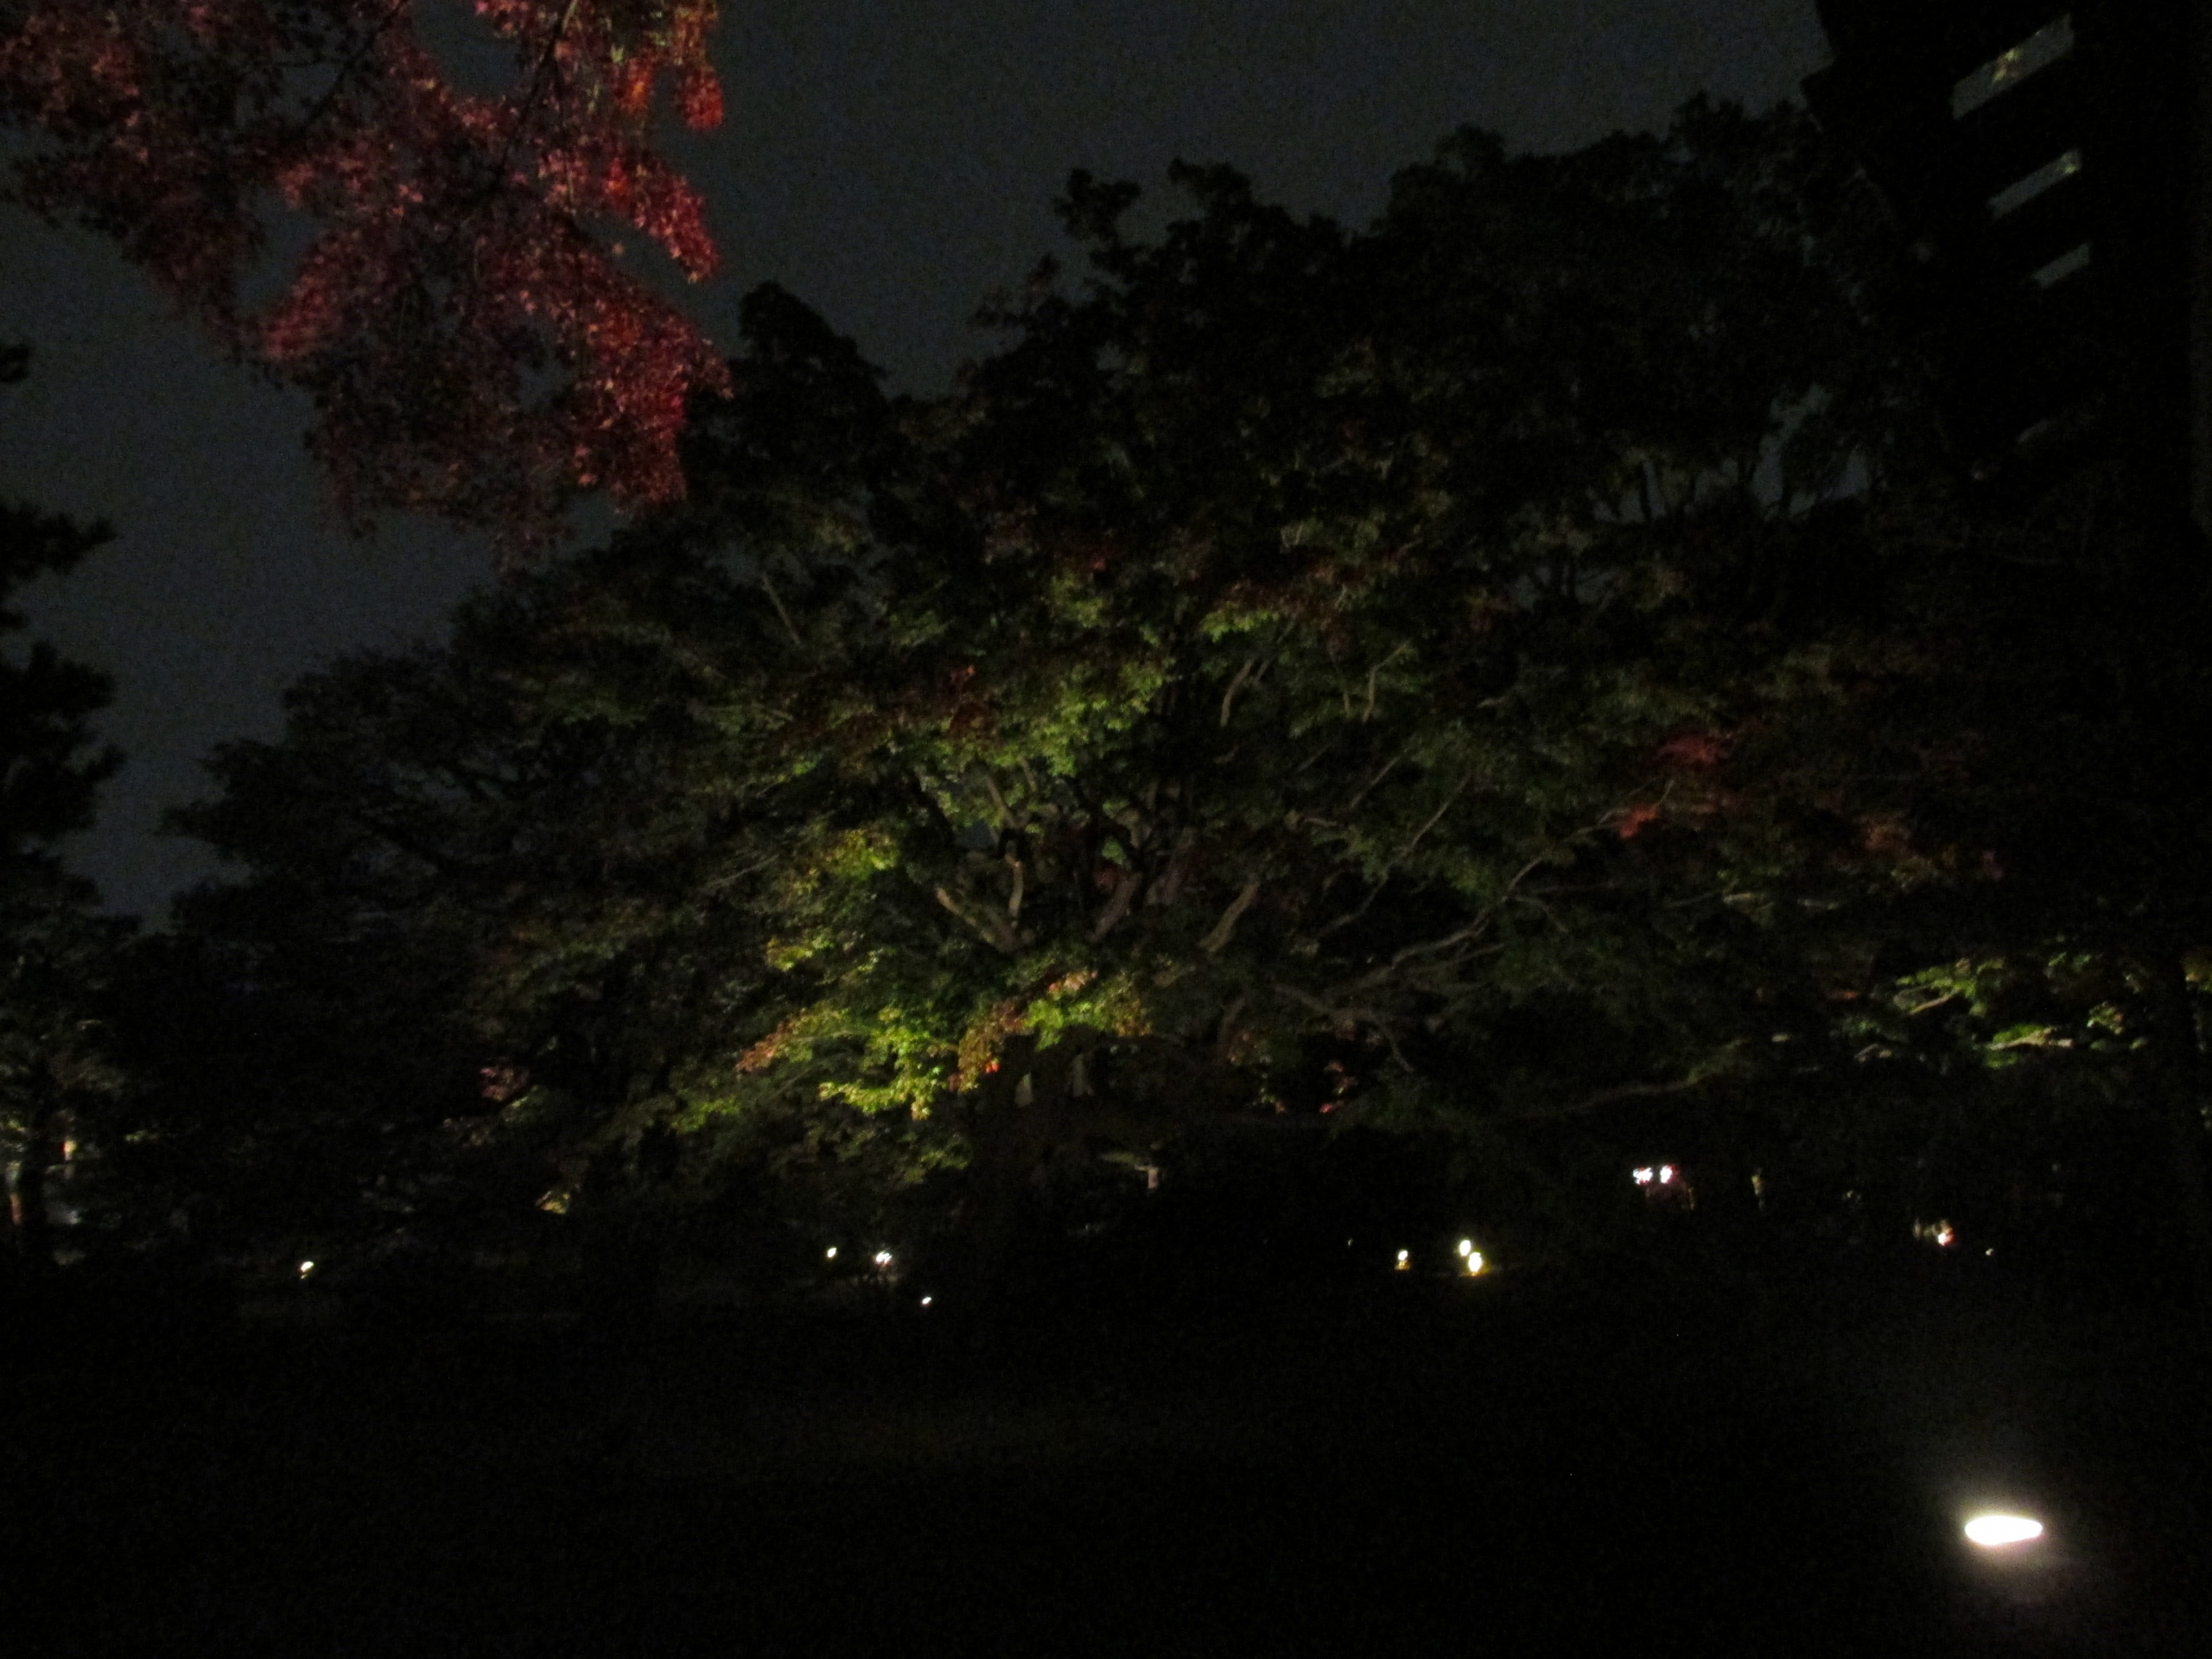 Night Illumination Show